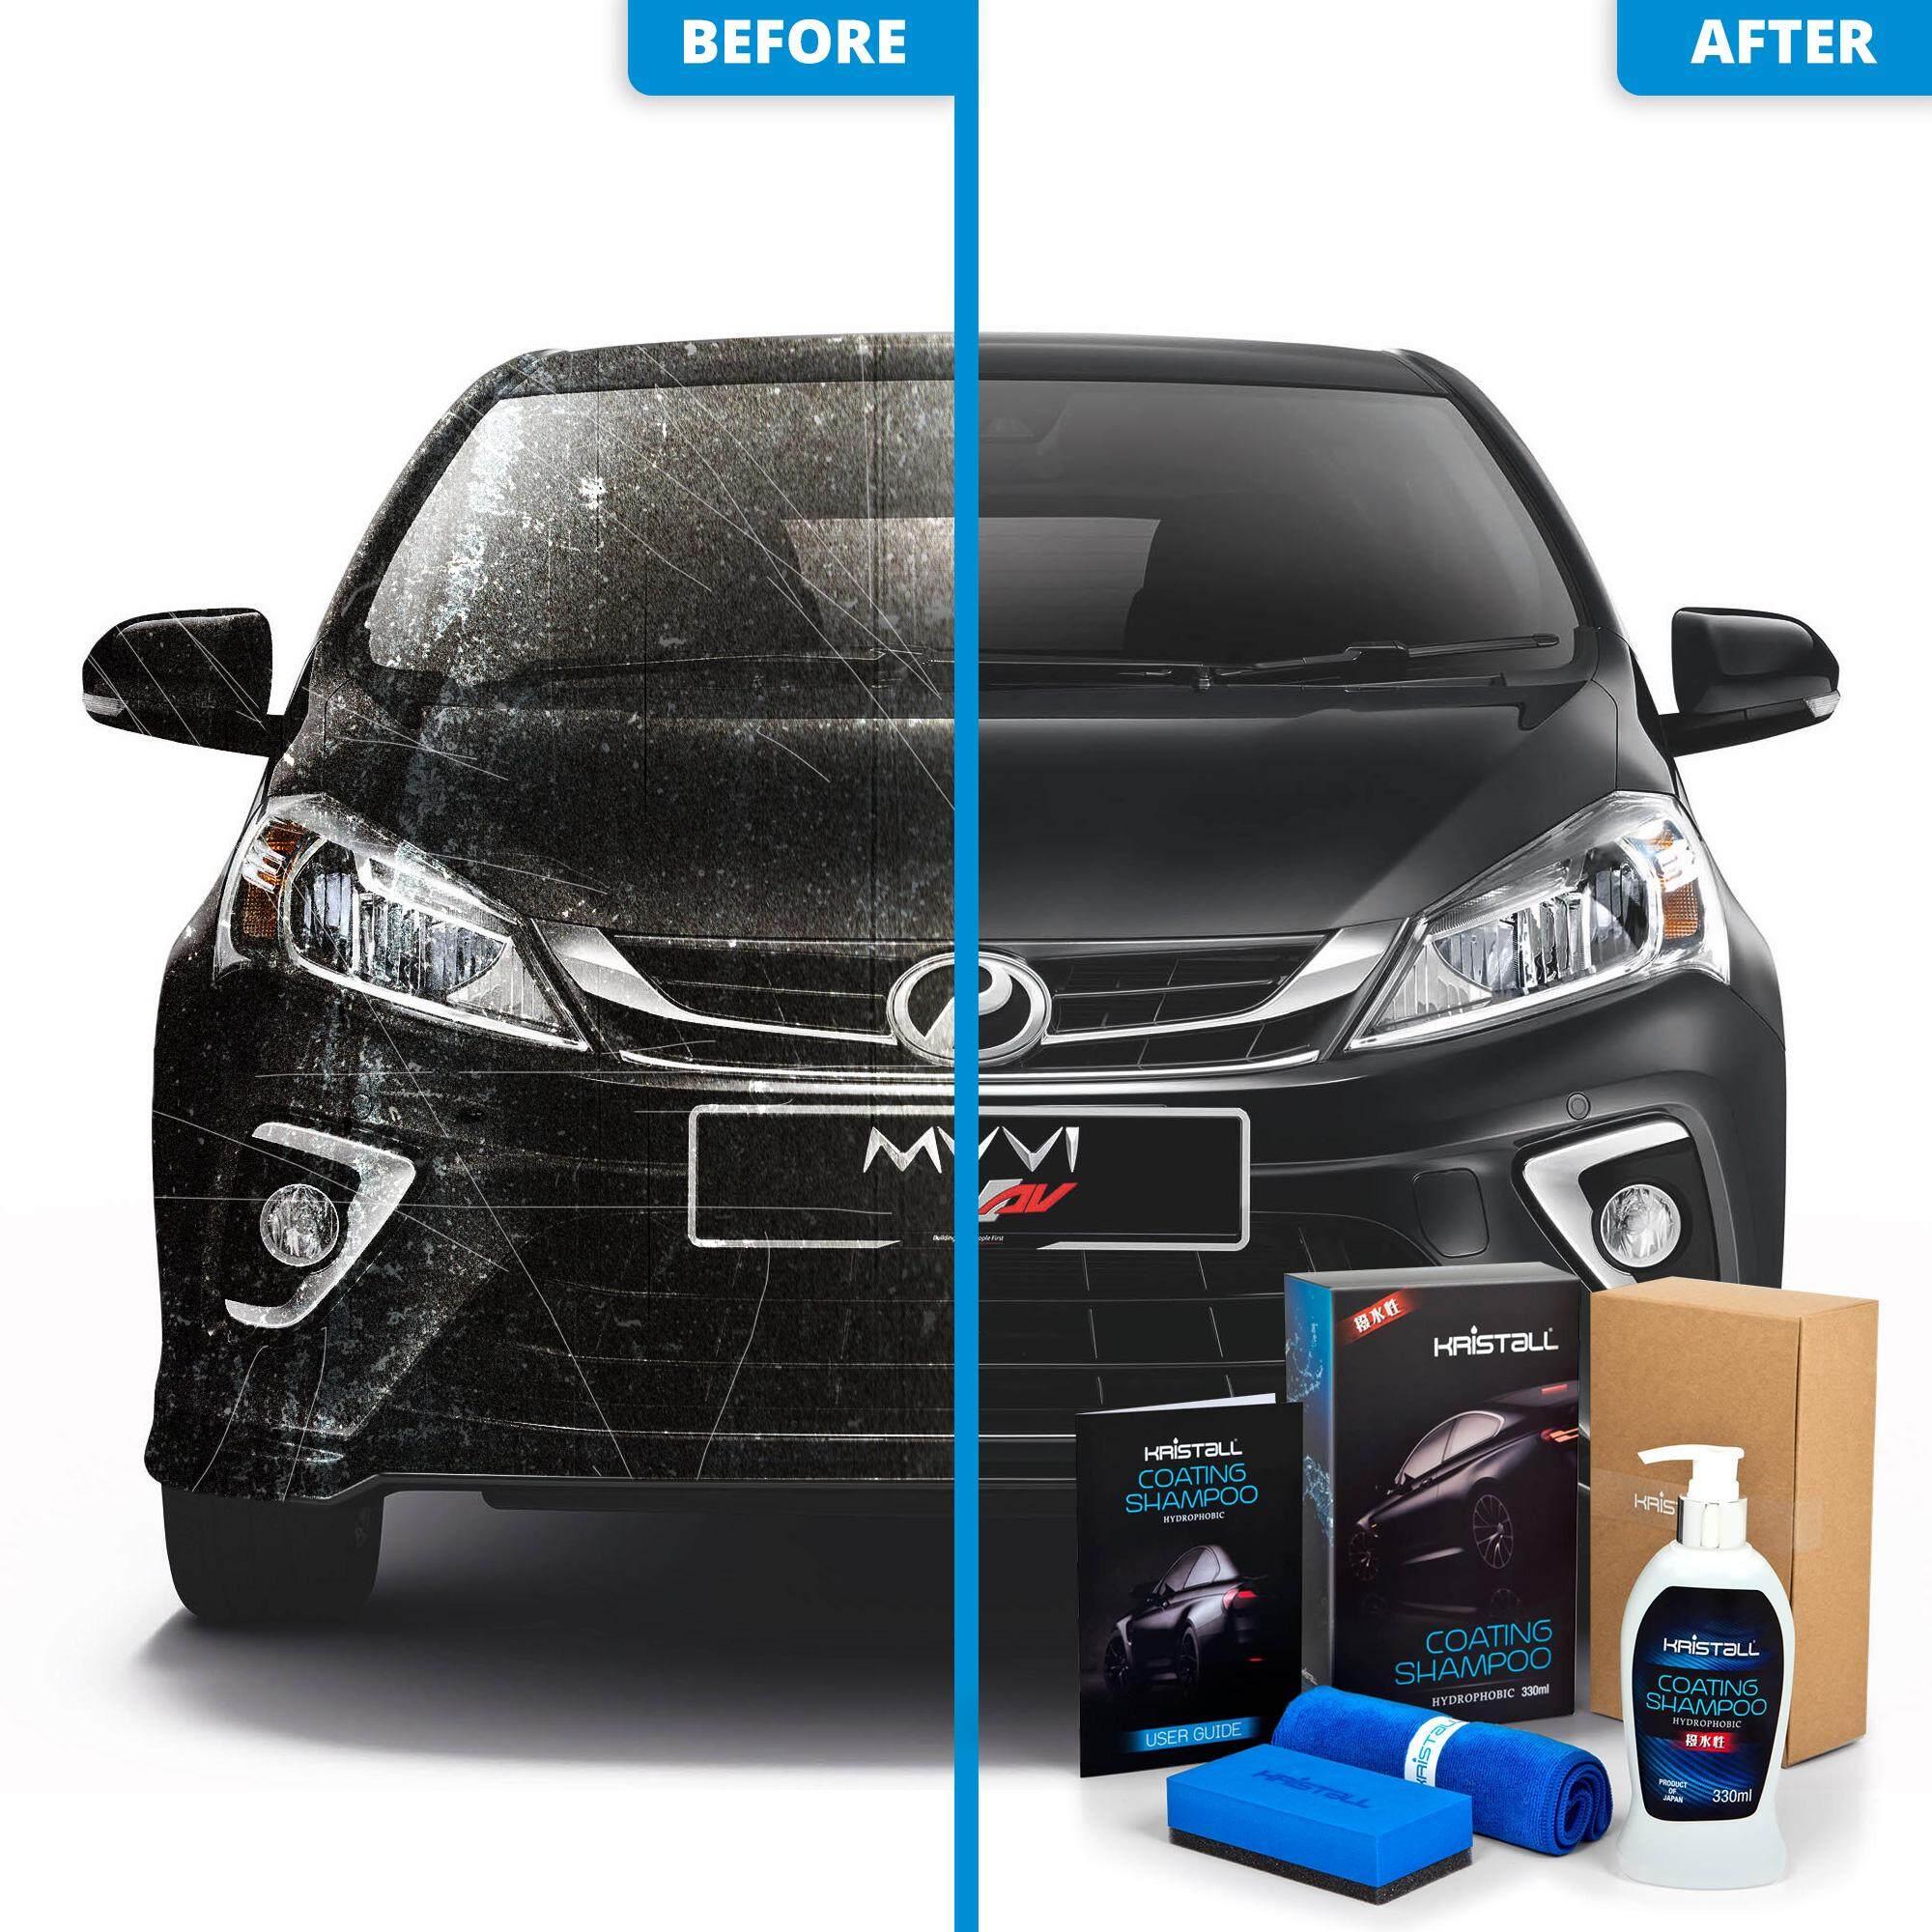 Perodua Myvi Coating Shampoo - Kristall® Car Shampoo WITH Nano Coating (Car Paint Protection, Super Hydrophobic, Deep Gloss, 6.5 pH Balanced Neutral Shampoo)